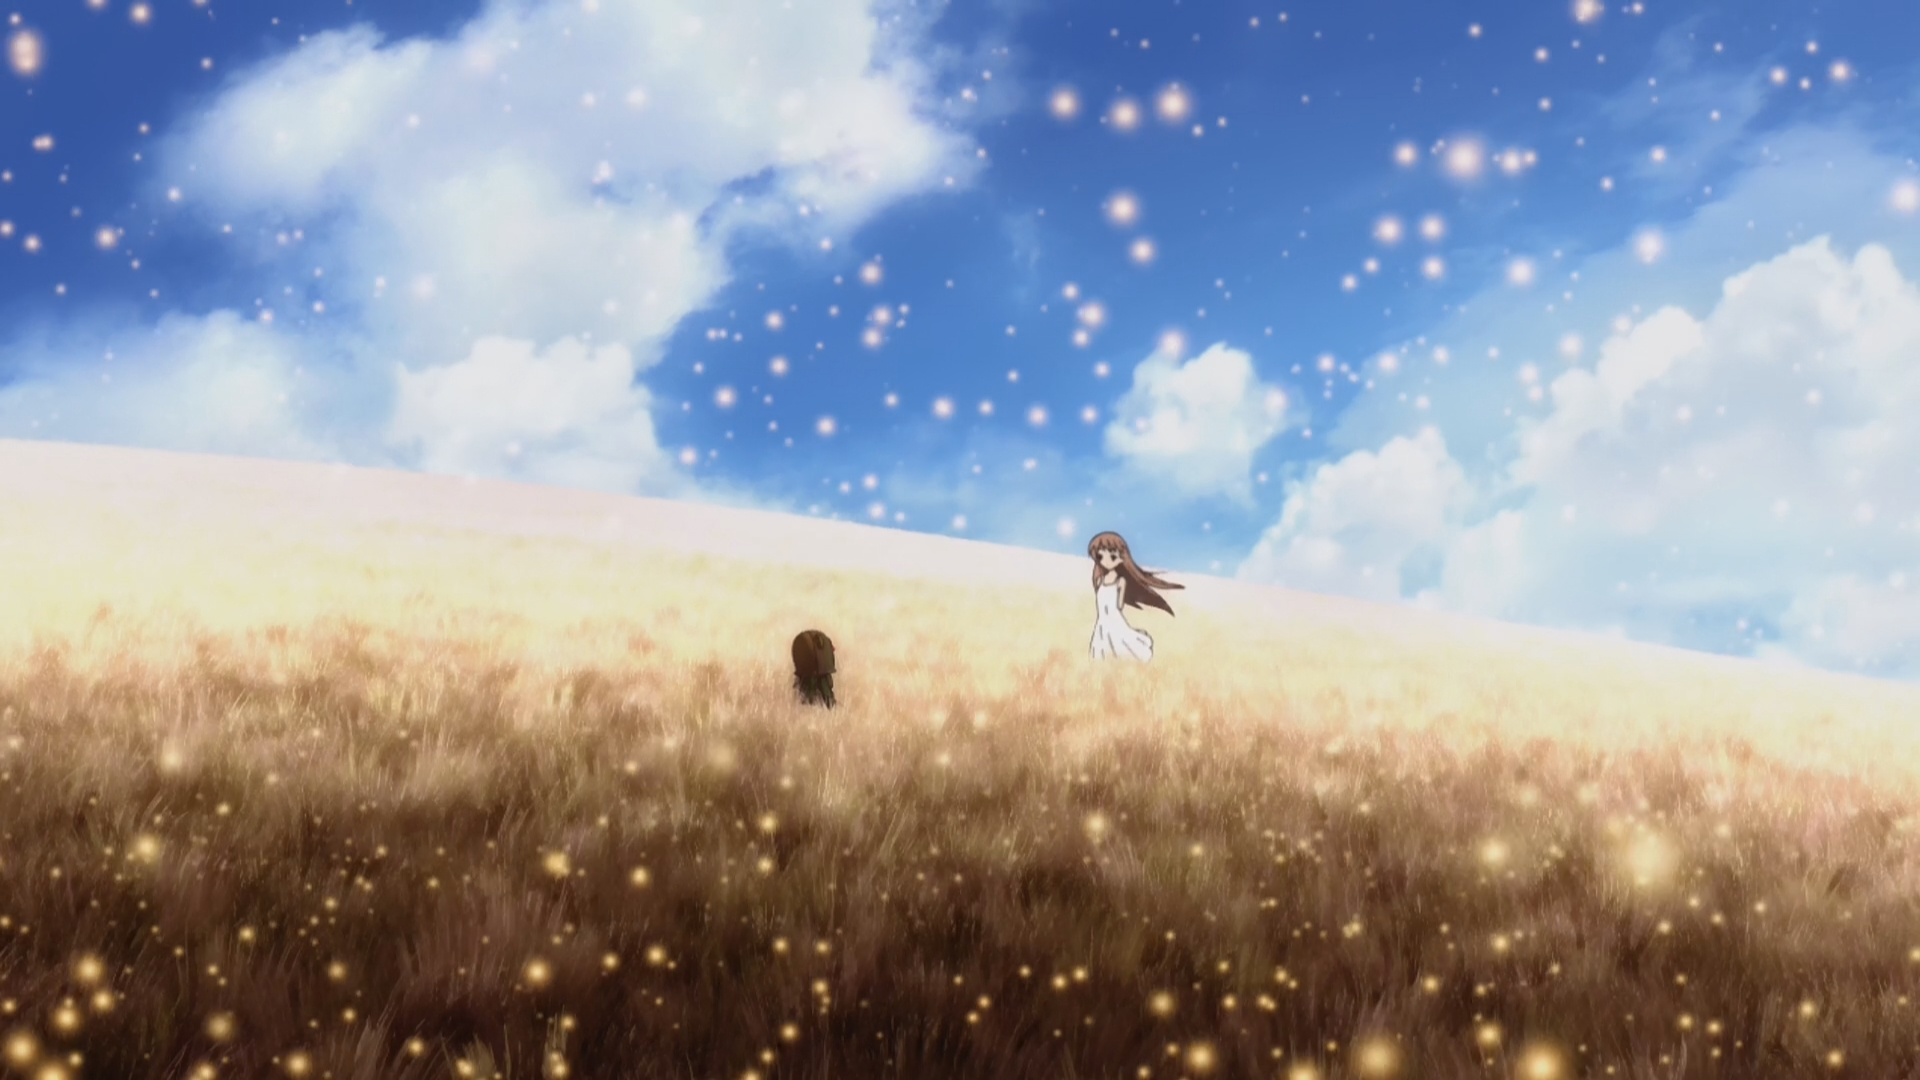 anime wallpaper gif